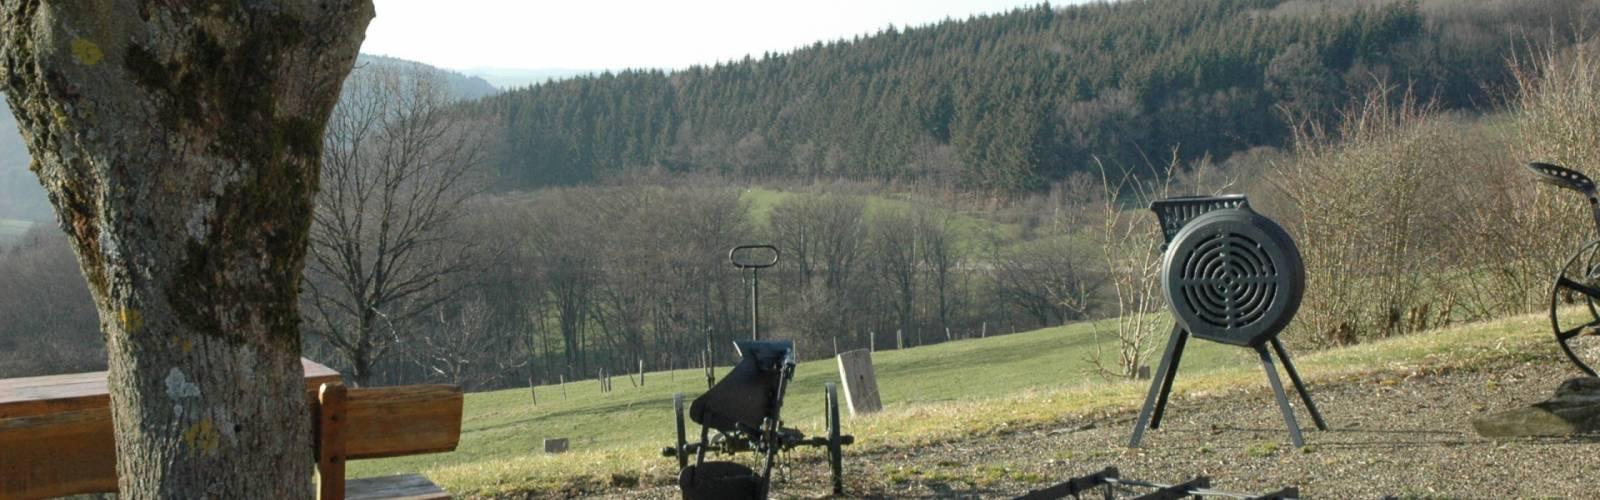 photos internet 2011 032 scaled